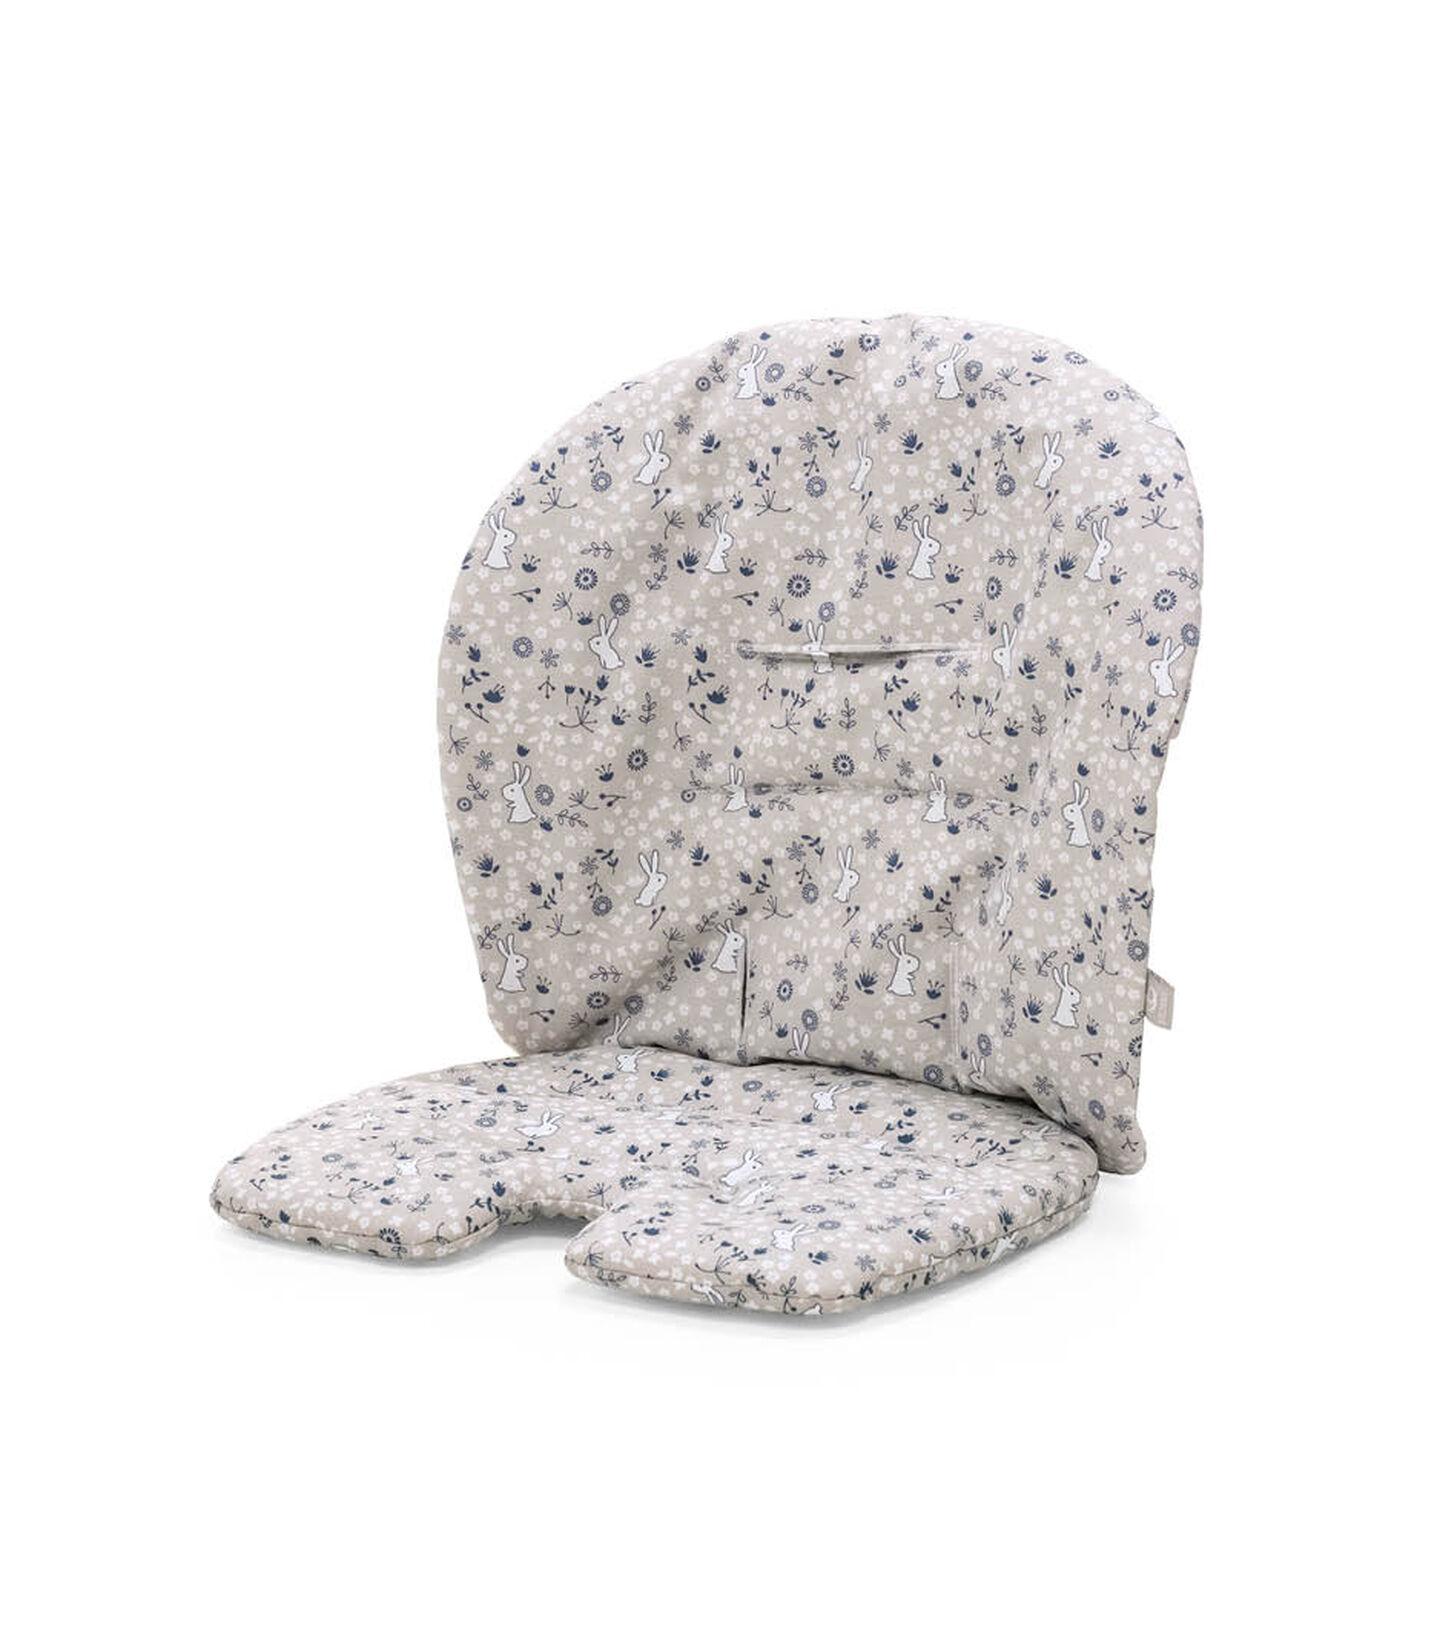 Stokke® Steps™ Baby Set Cushion Garden Bunny, Garden Bunny, mainview view 2